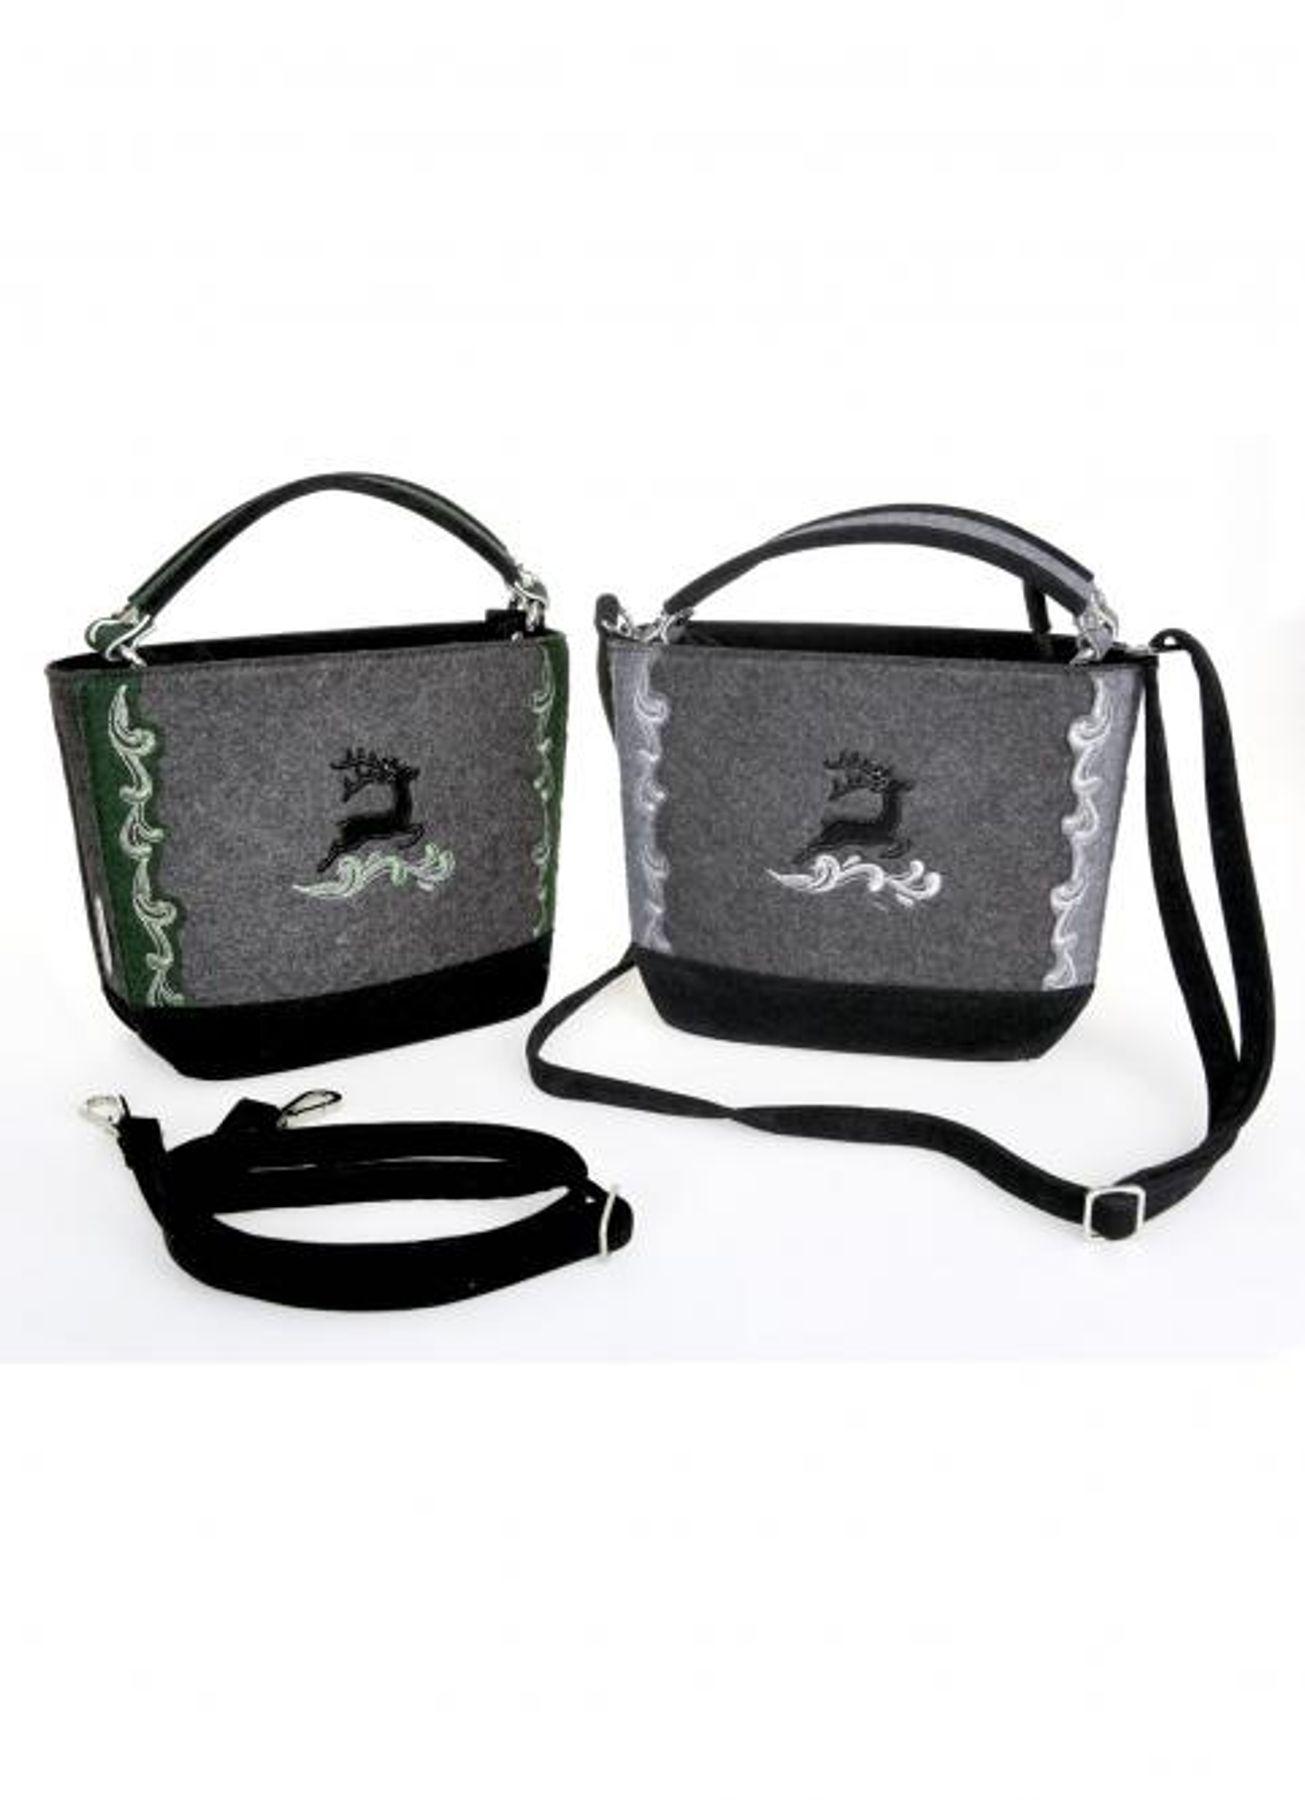 Spieth & Wensky - Handtasche, Alison (240910-0768)